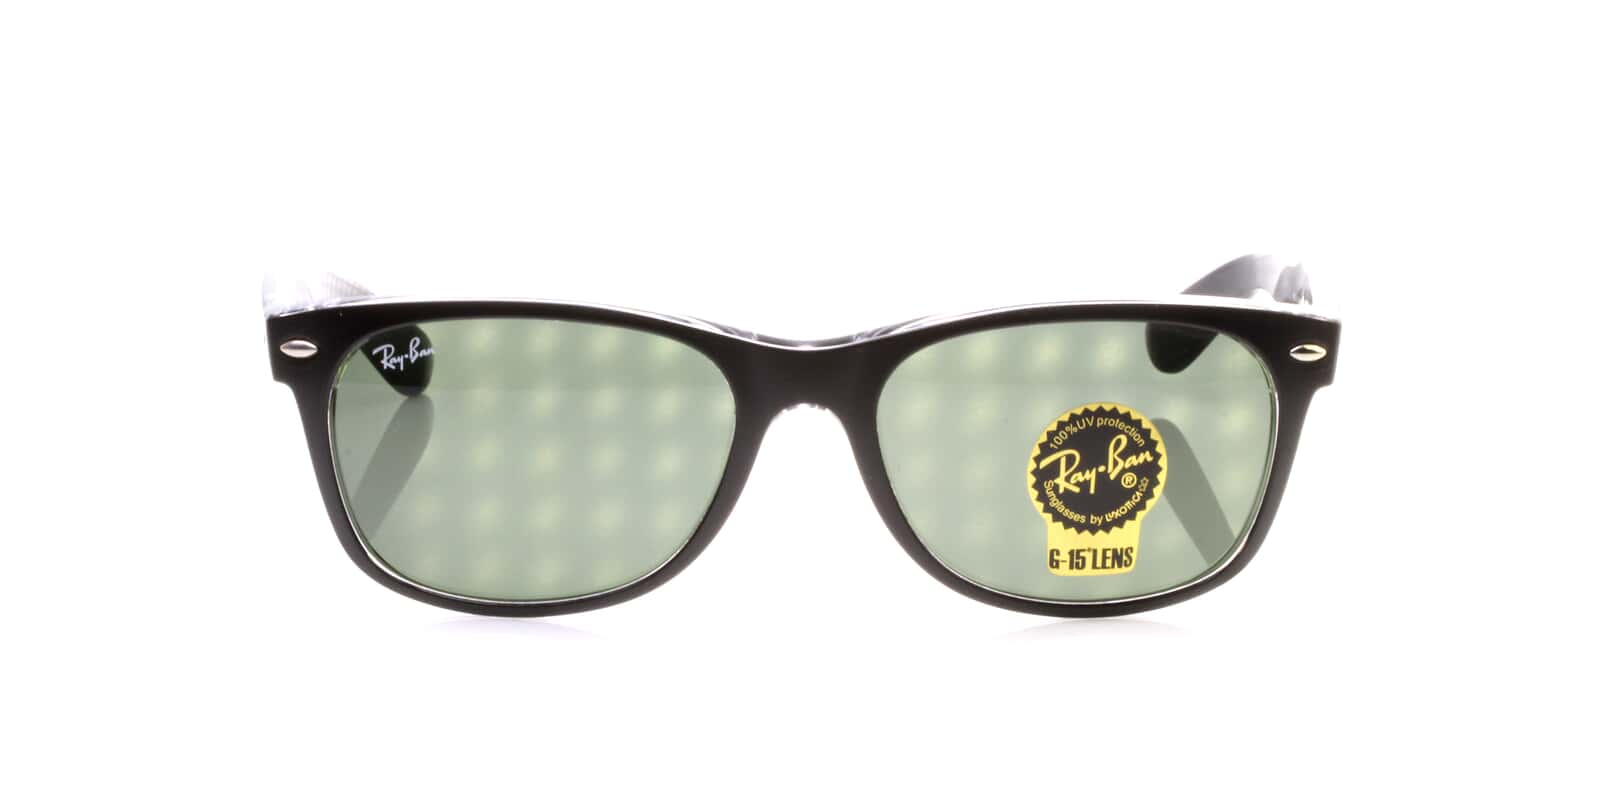 918f8c697e0 Buy Ray Ban RB2132 6052 (55-18-145) Sunglasses